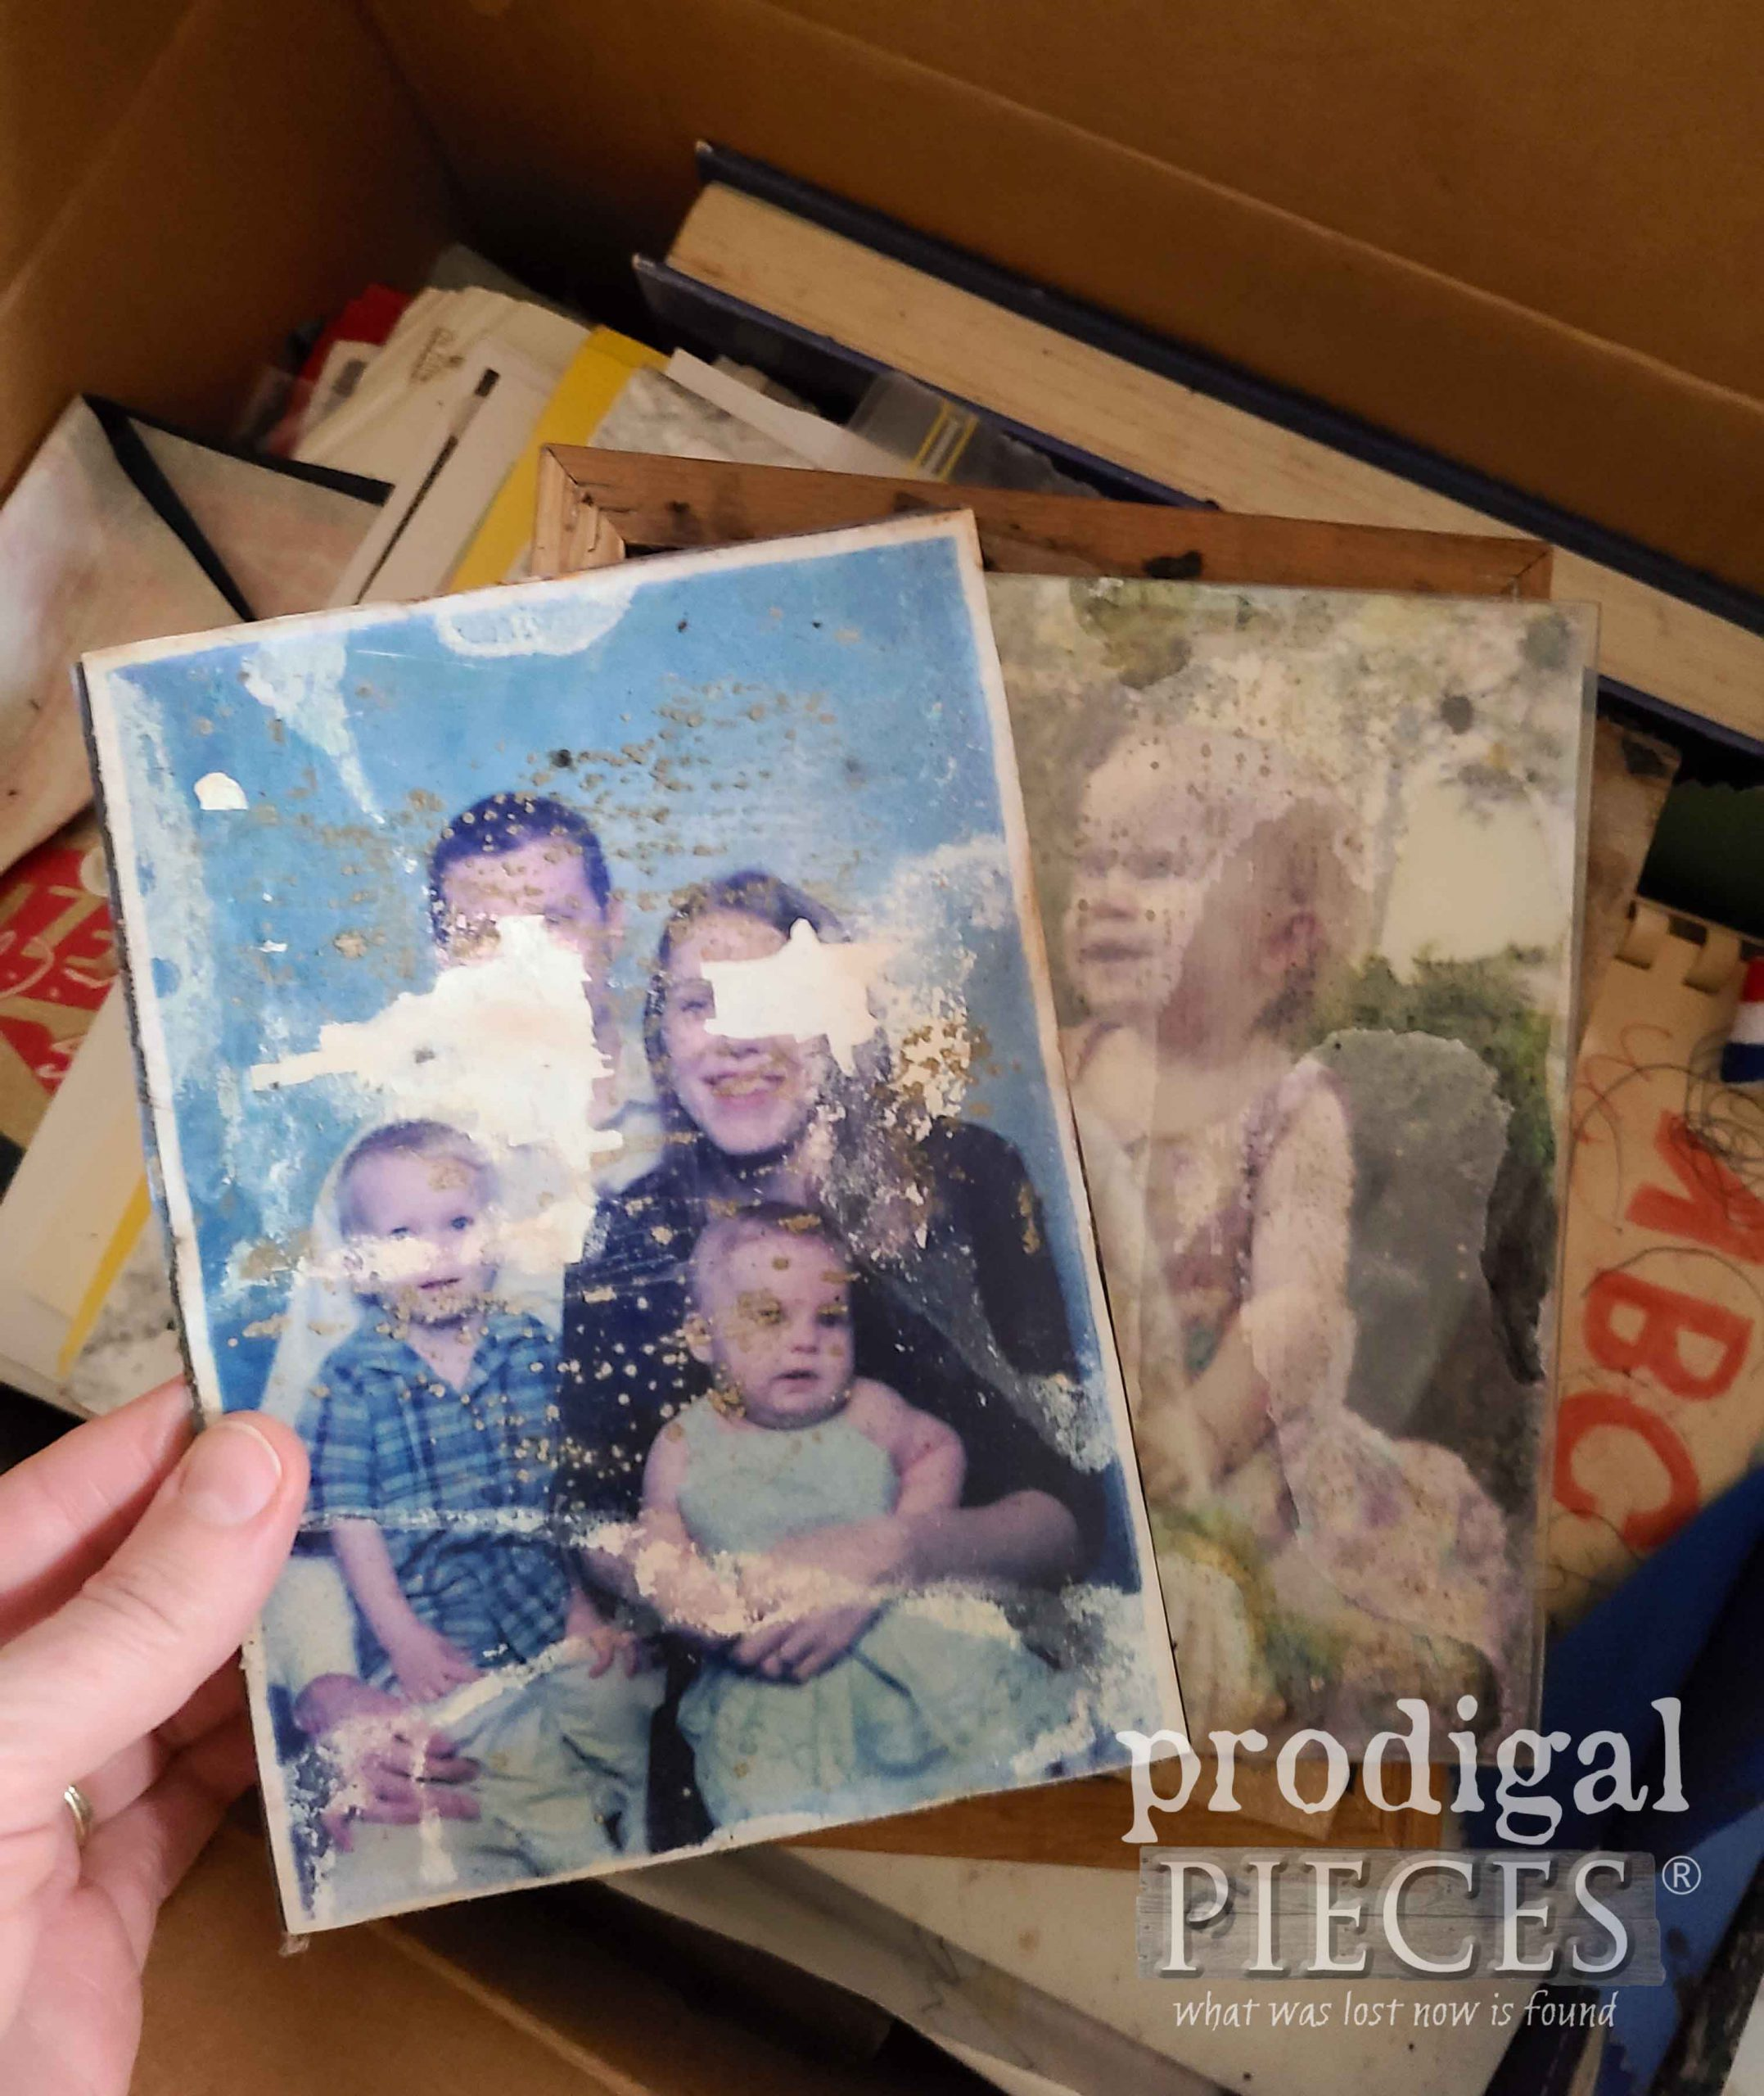 Damaged Photo | prodigalpieces.com